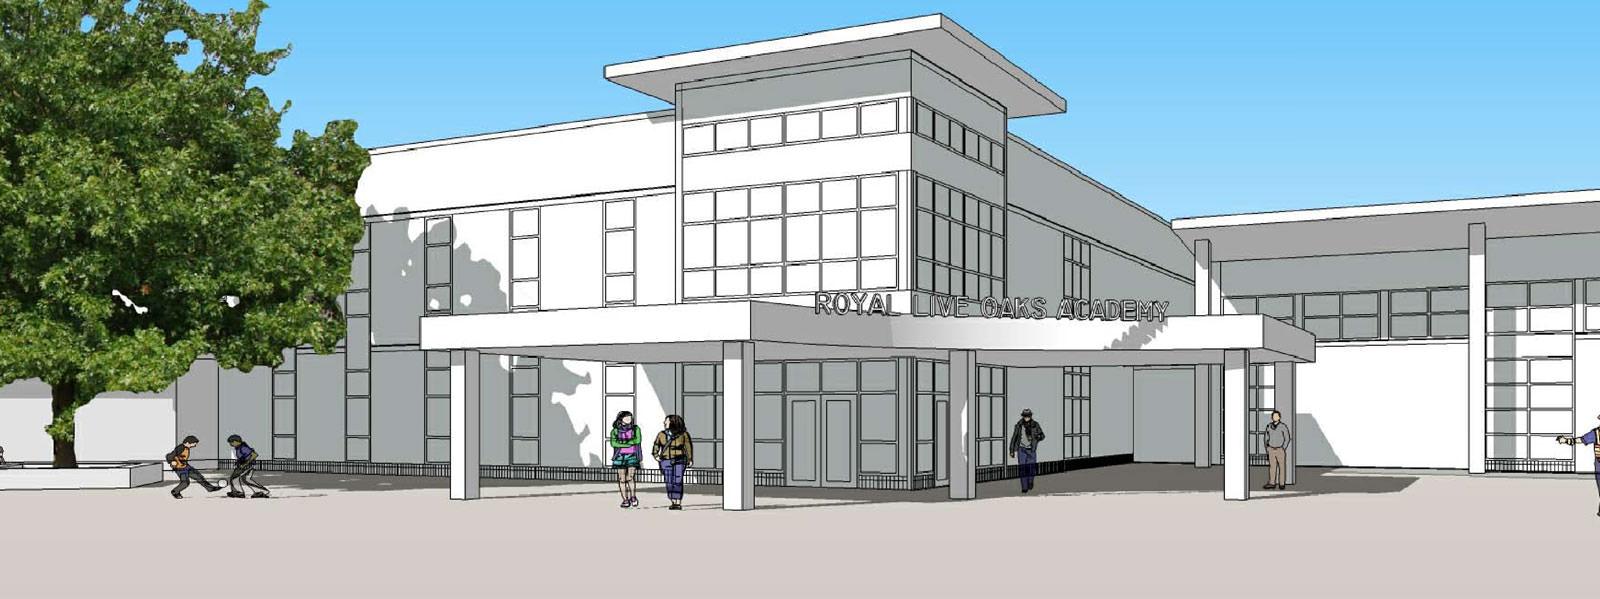 Royal Live Oaks Academy in Ridgeland, SC